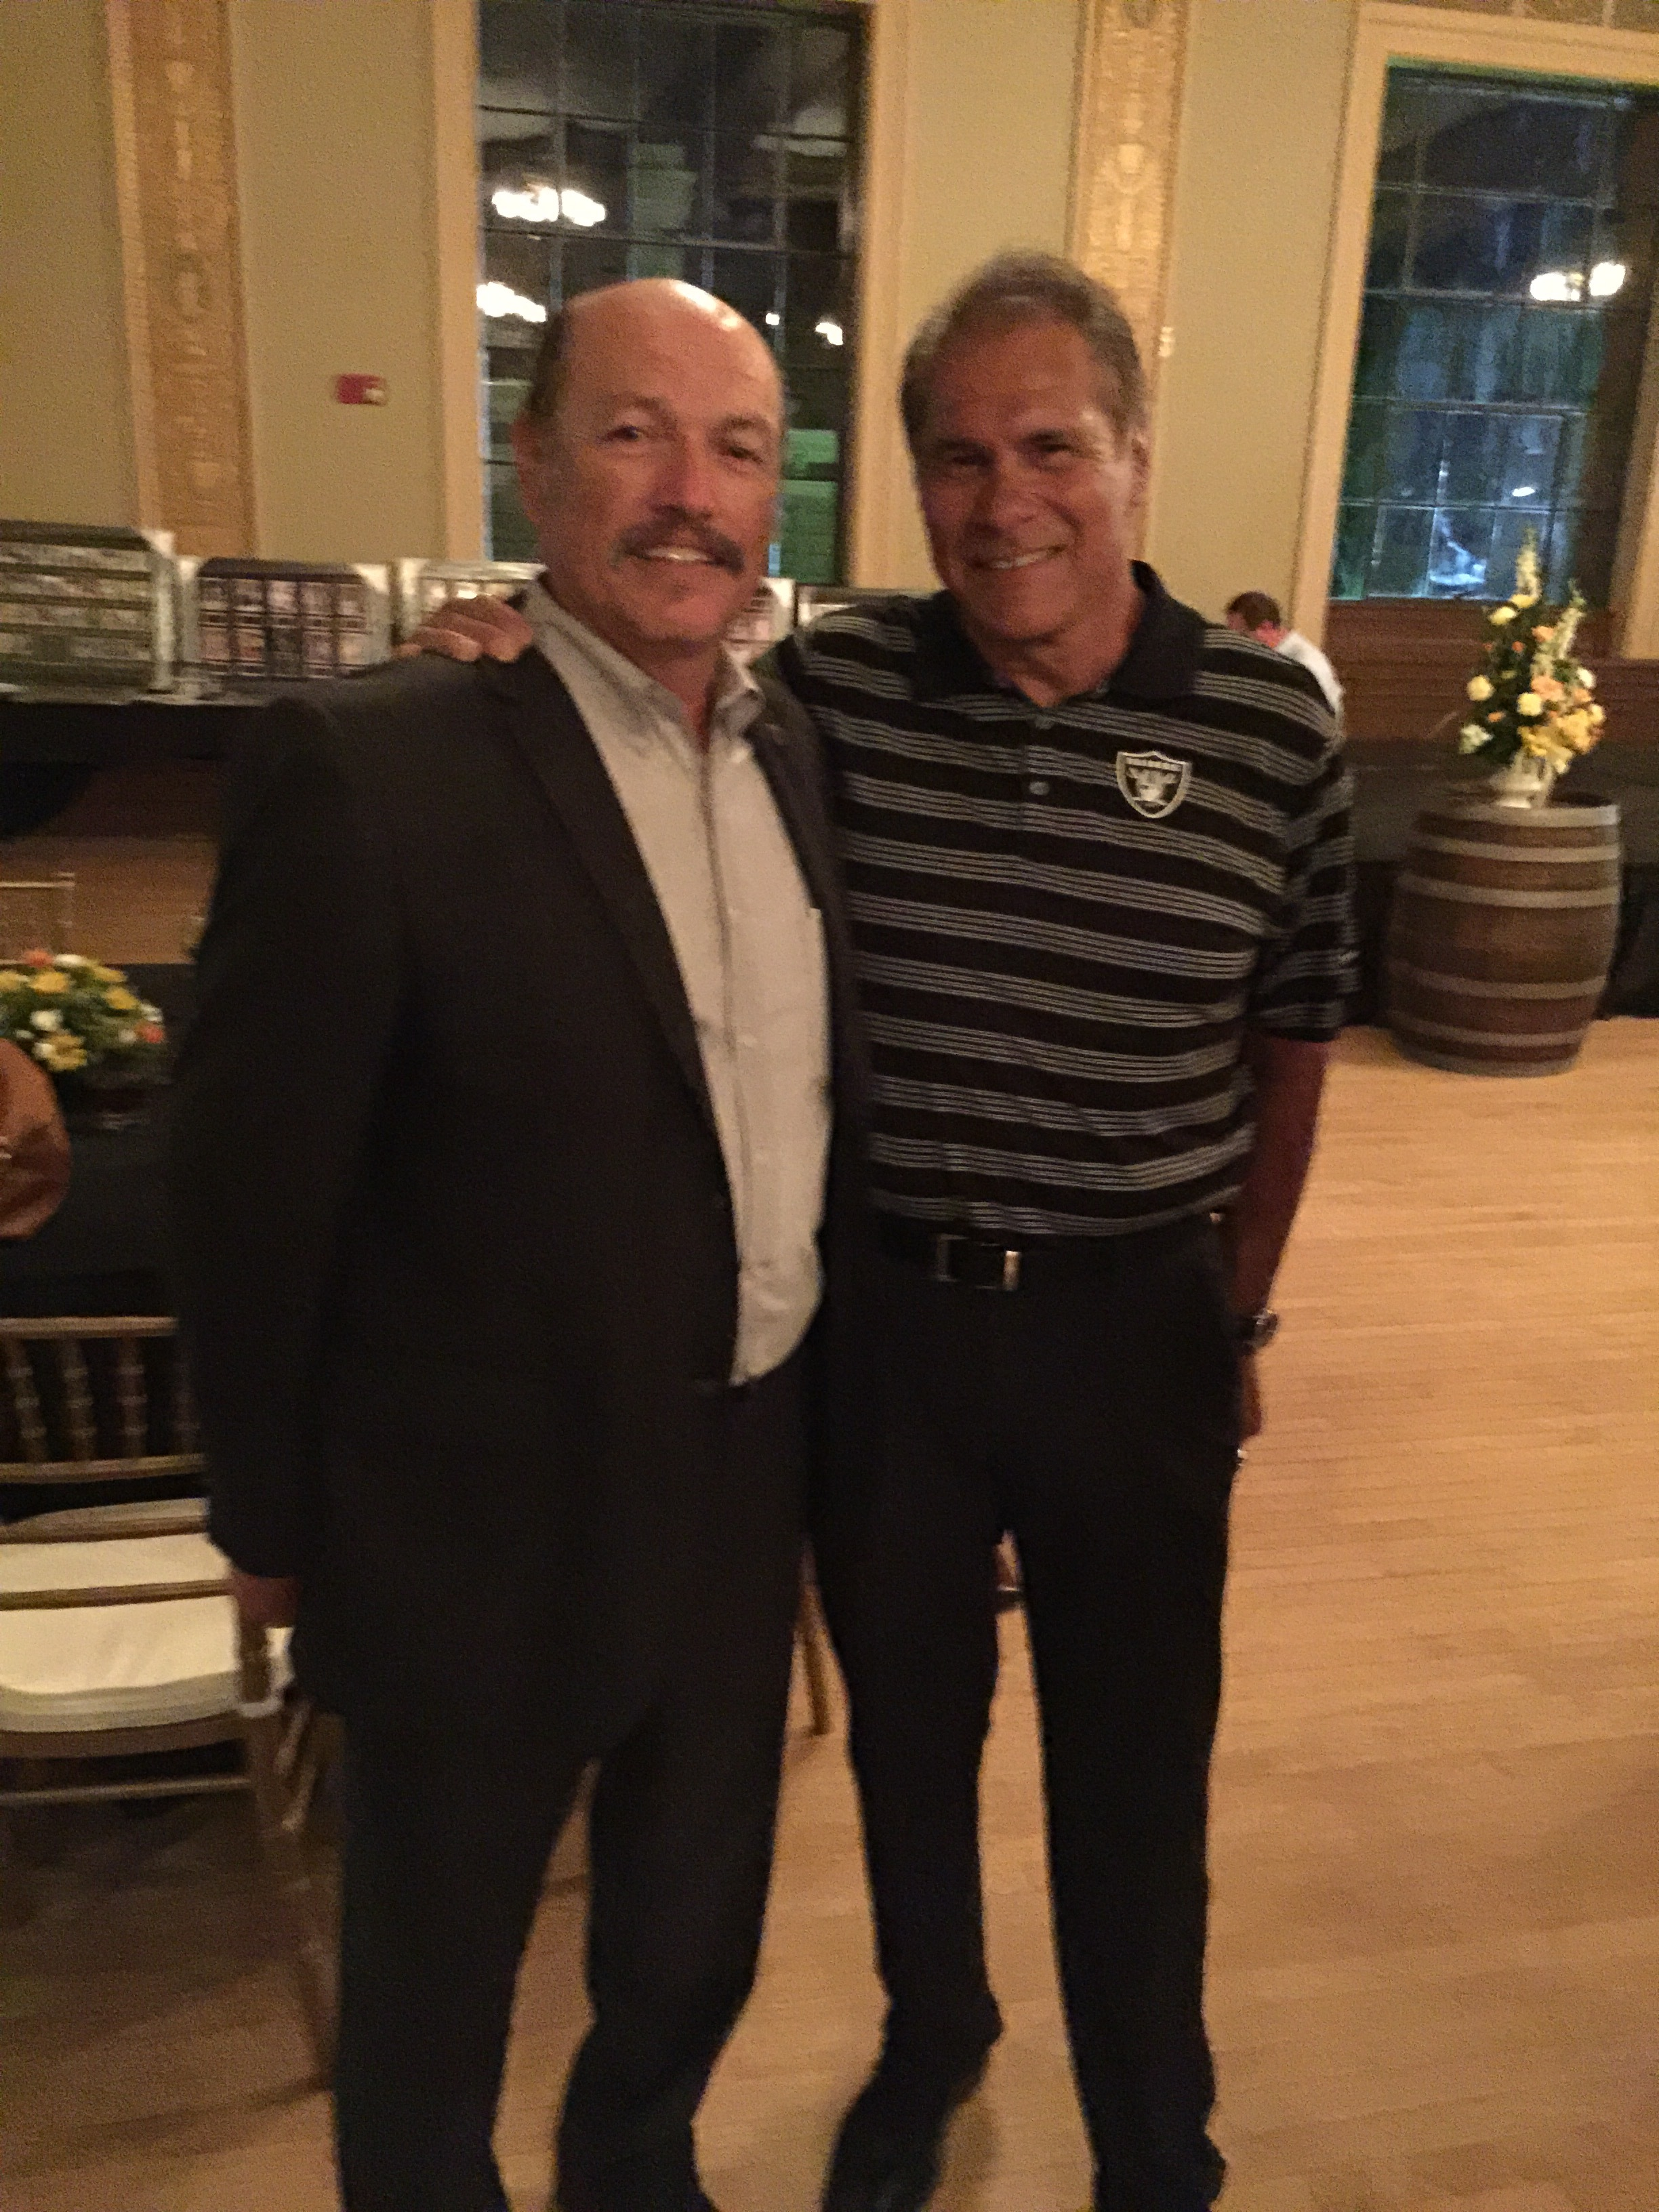 Tony with Super Bowl champion quarterback Jim Plunkett